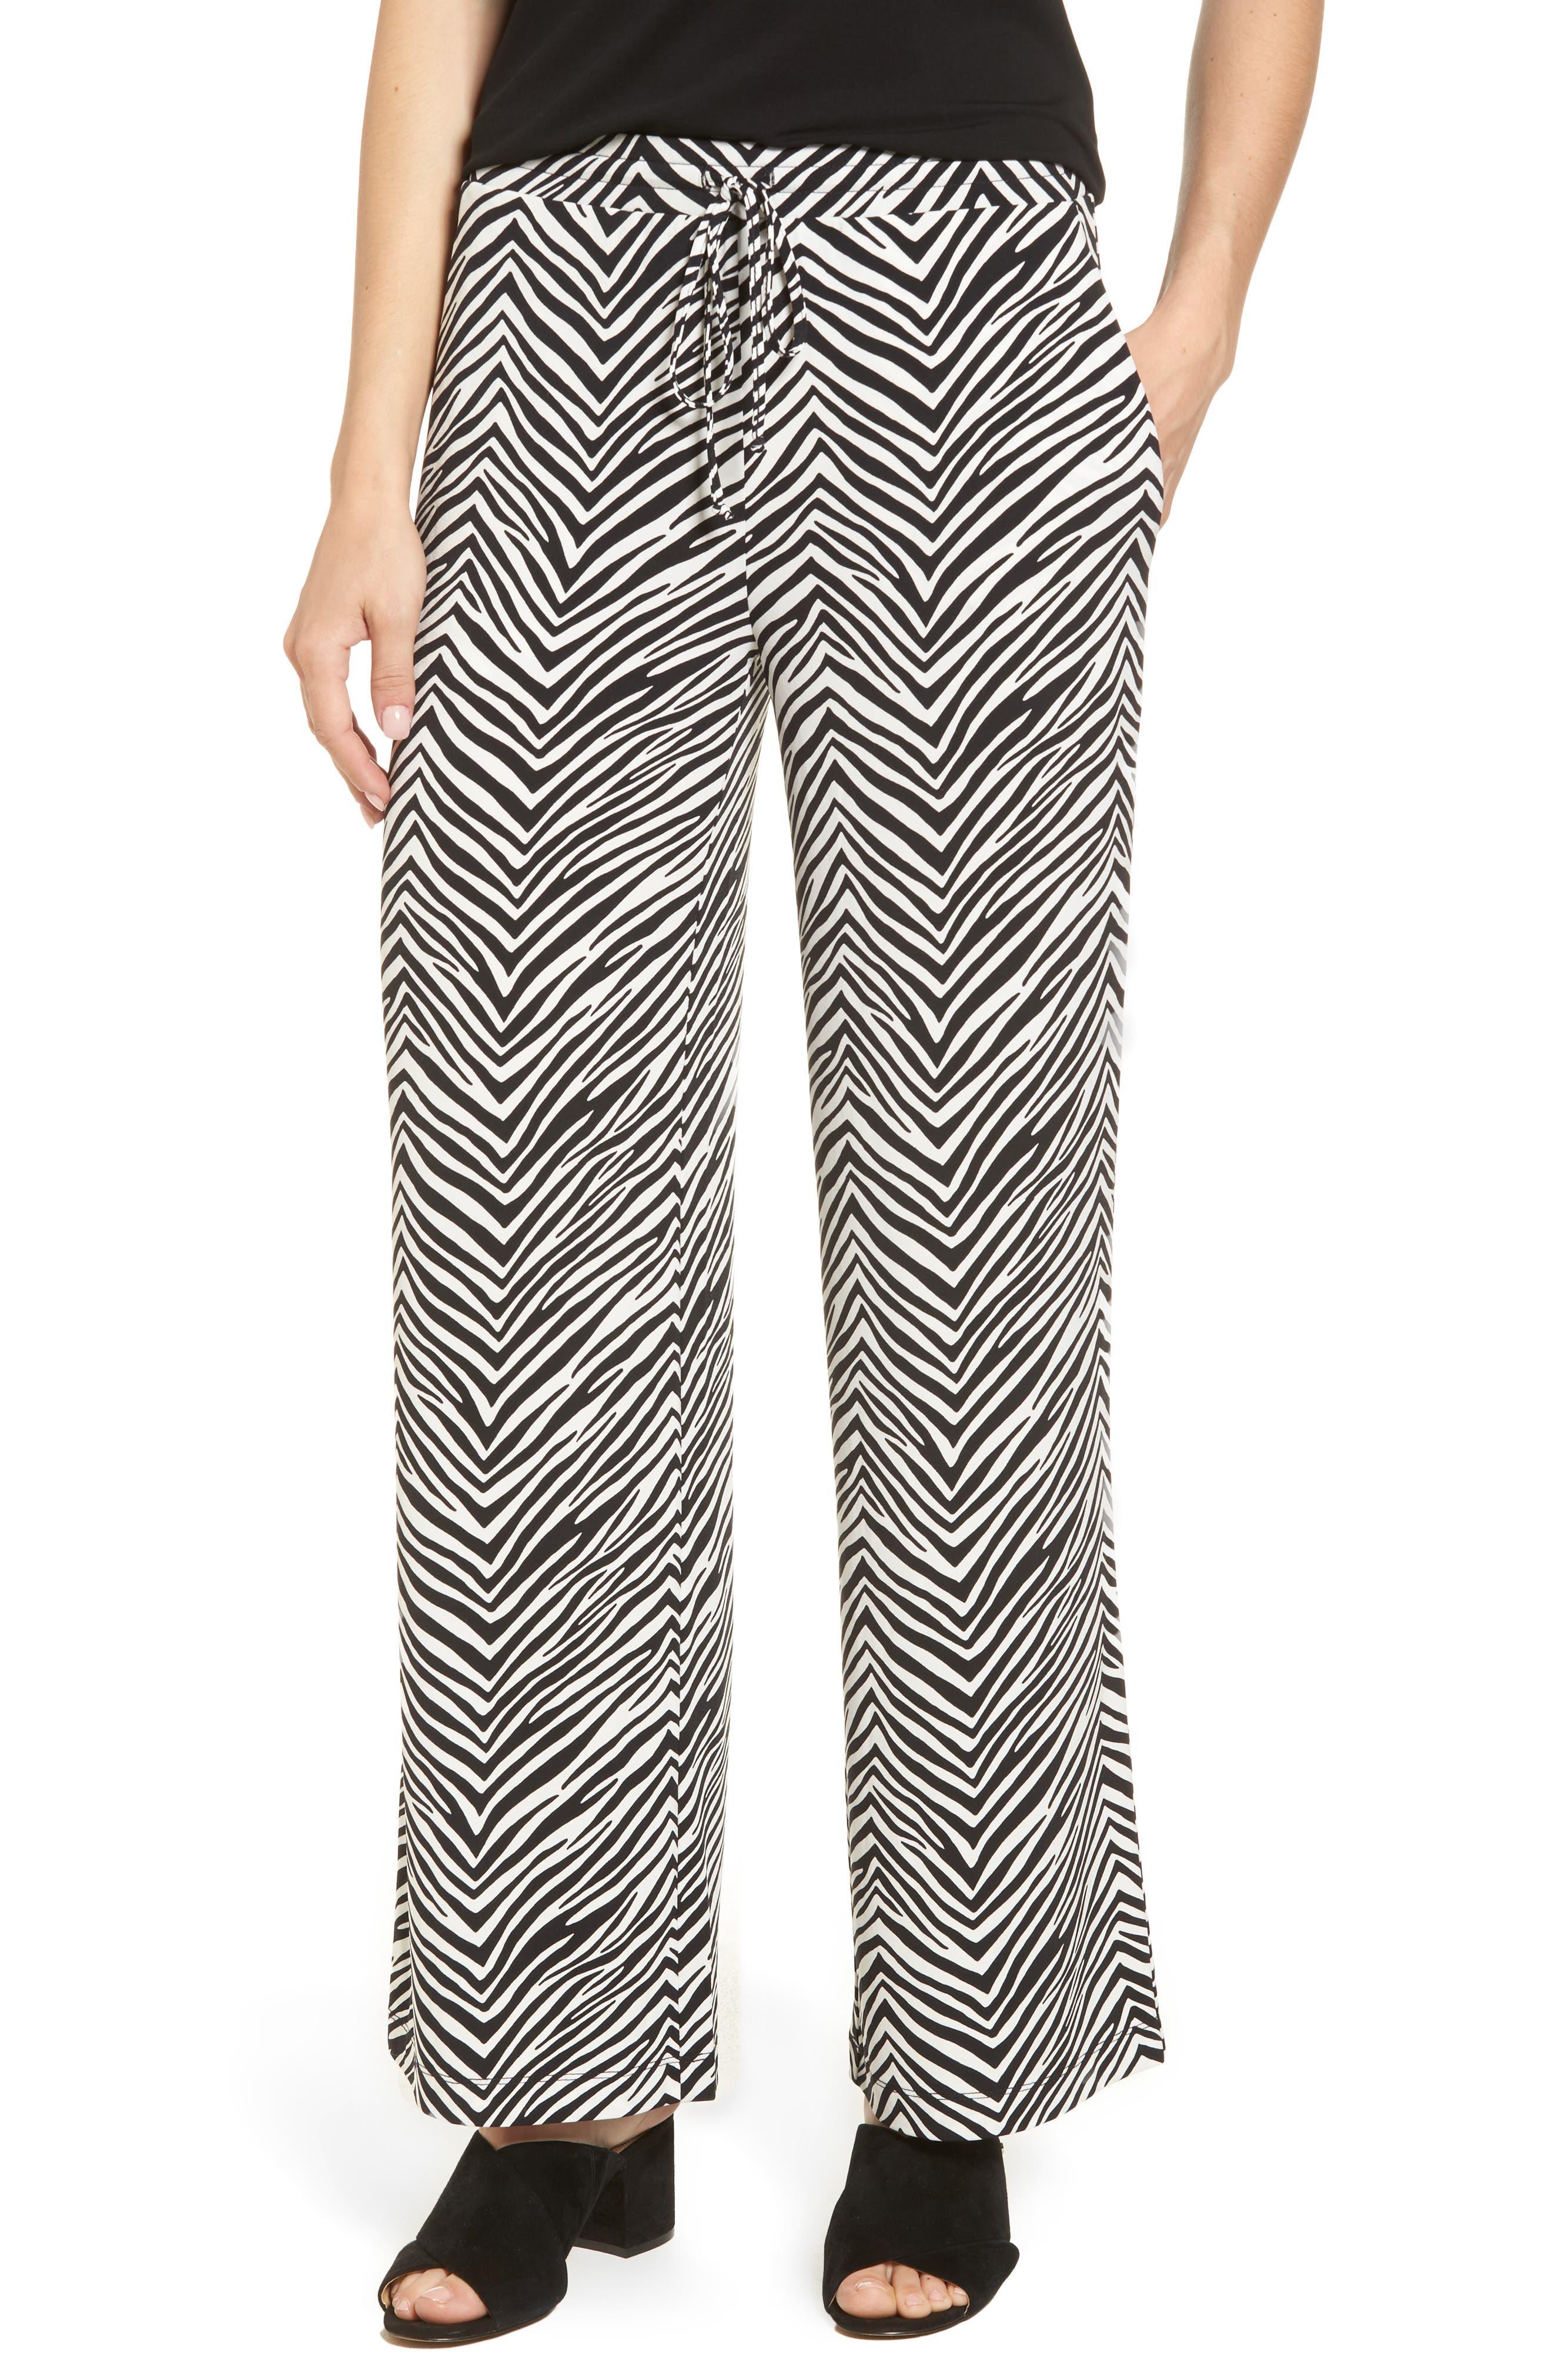 Zebra Print Drawstring Waist Pants,                         Main,                         color, 010